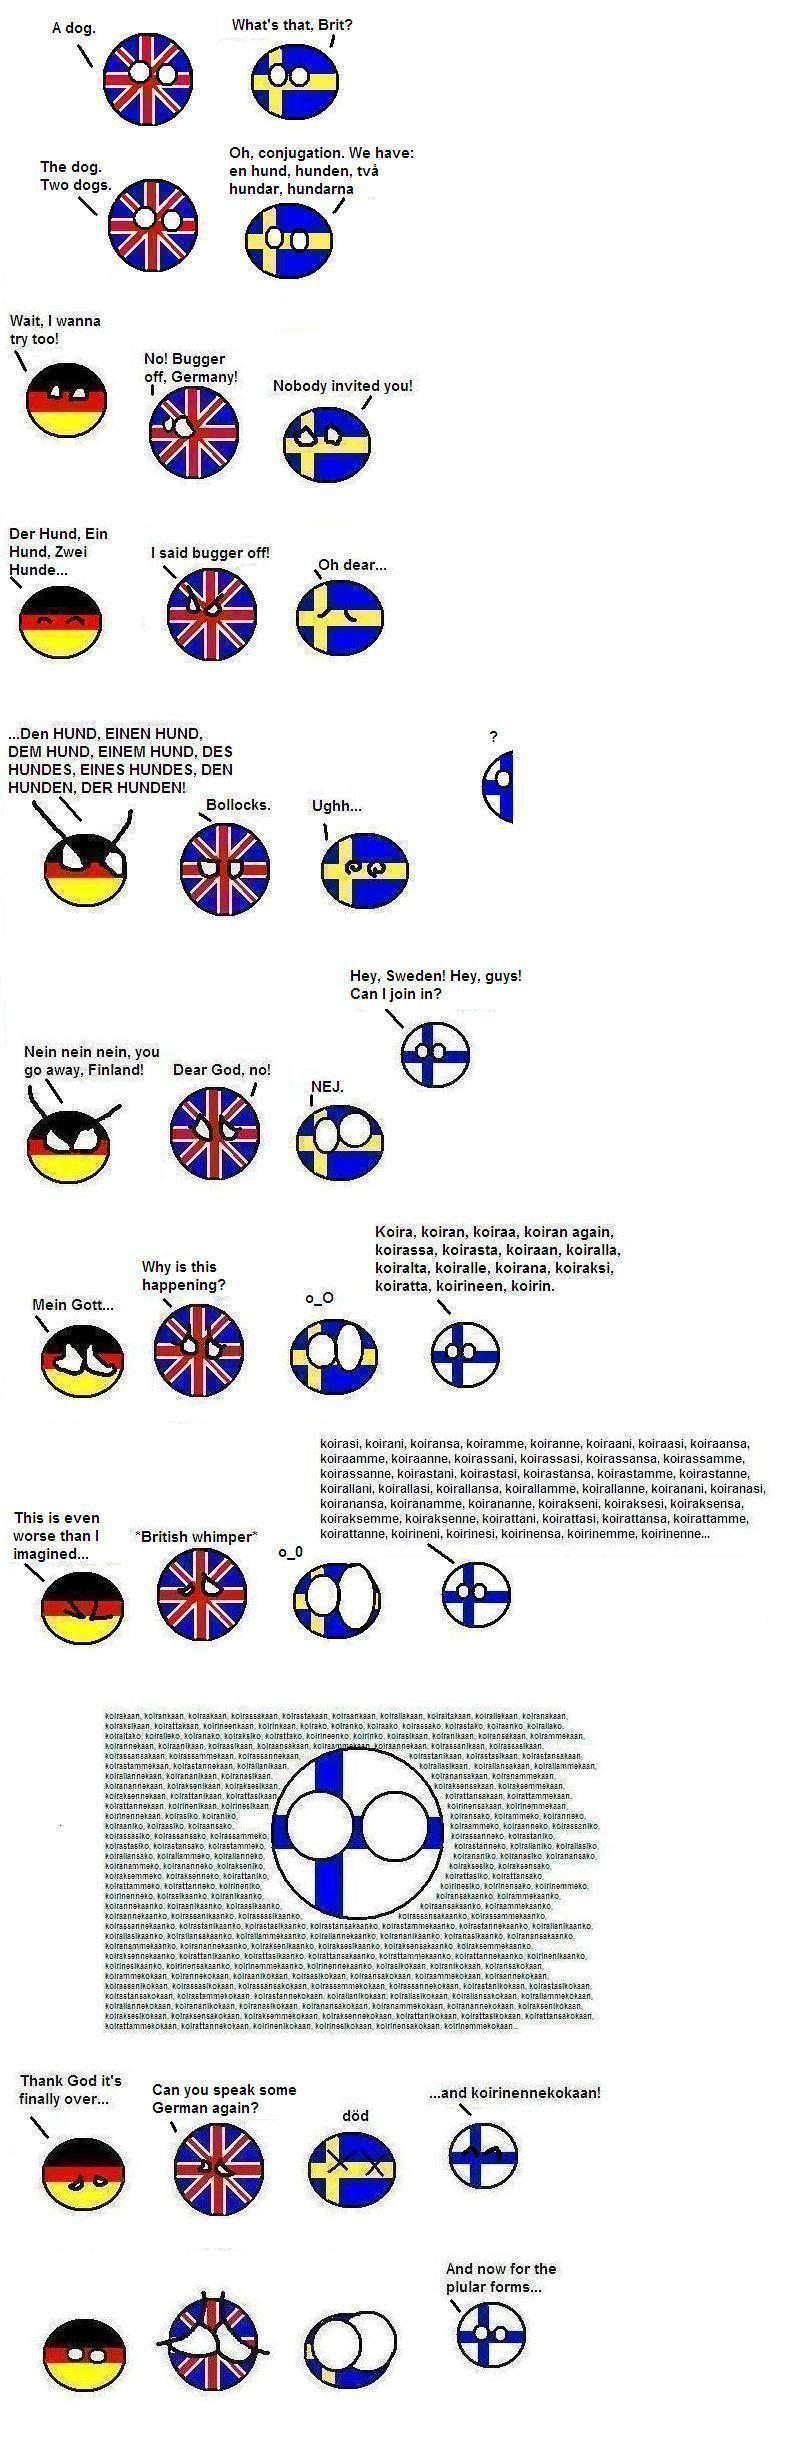 Finnish, it's the dog's ...